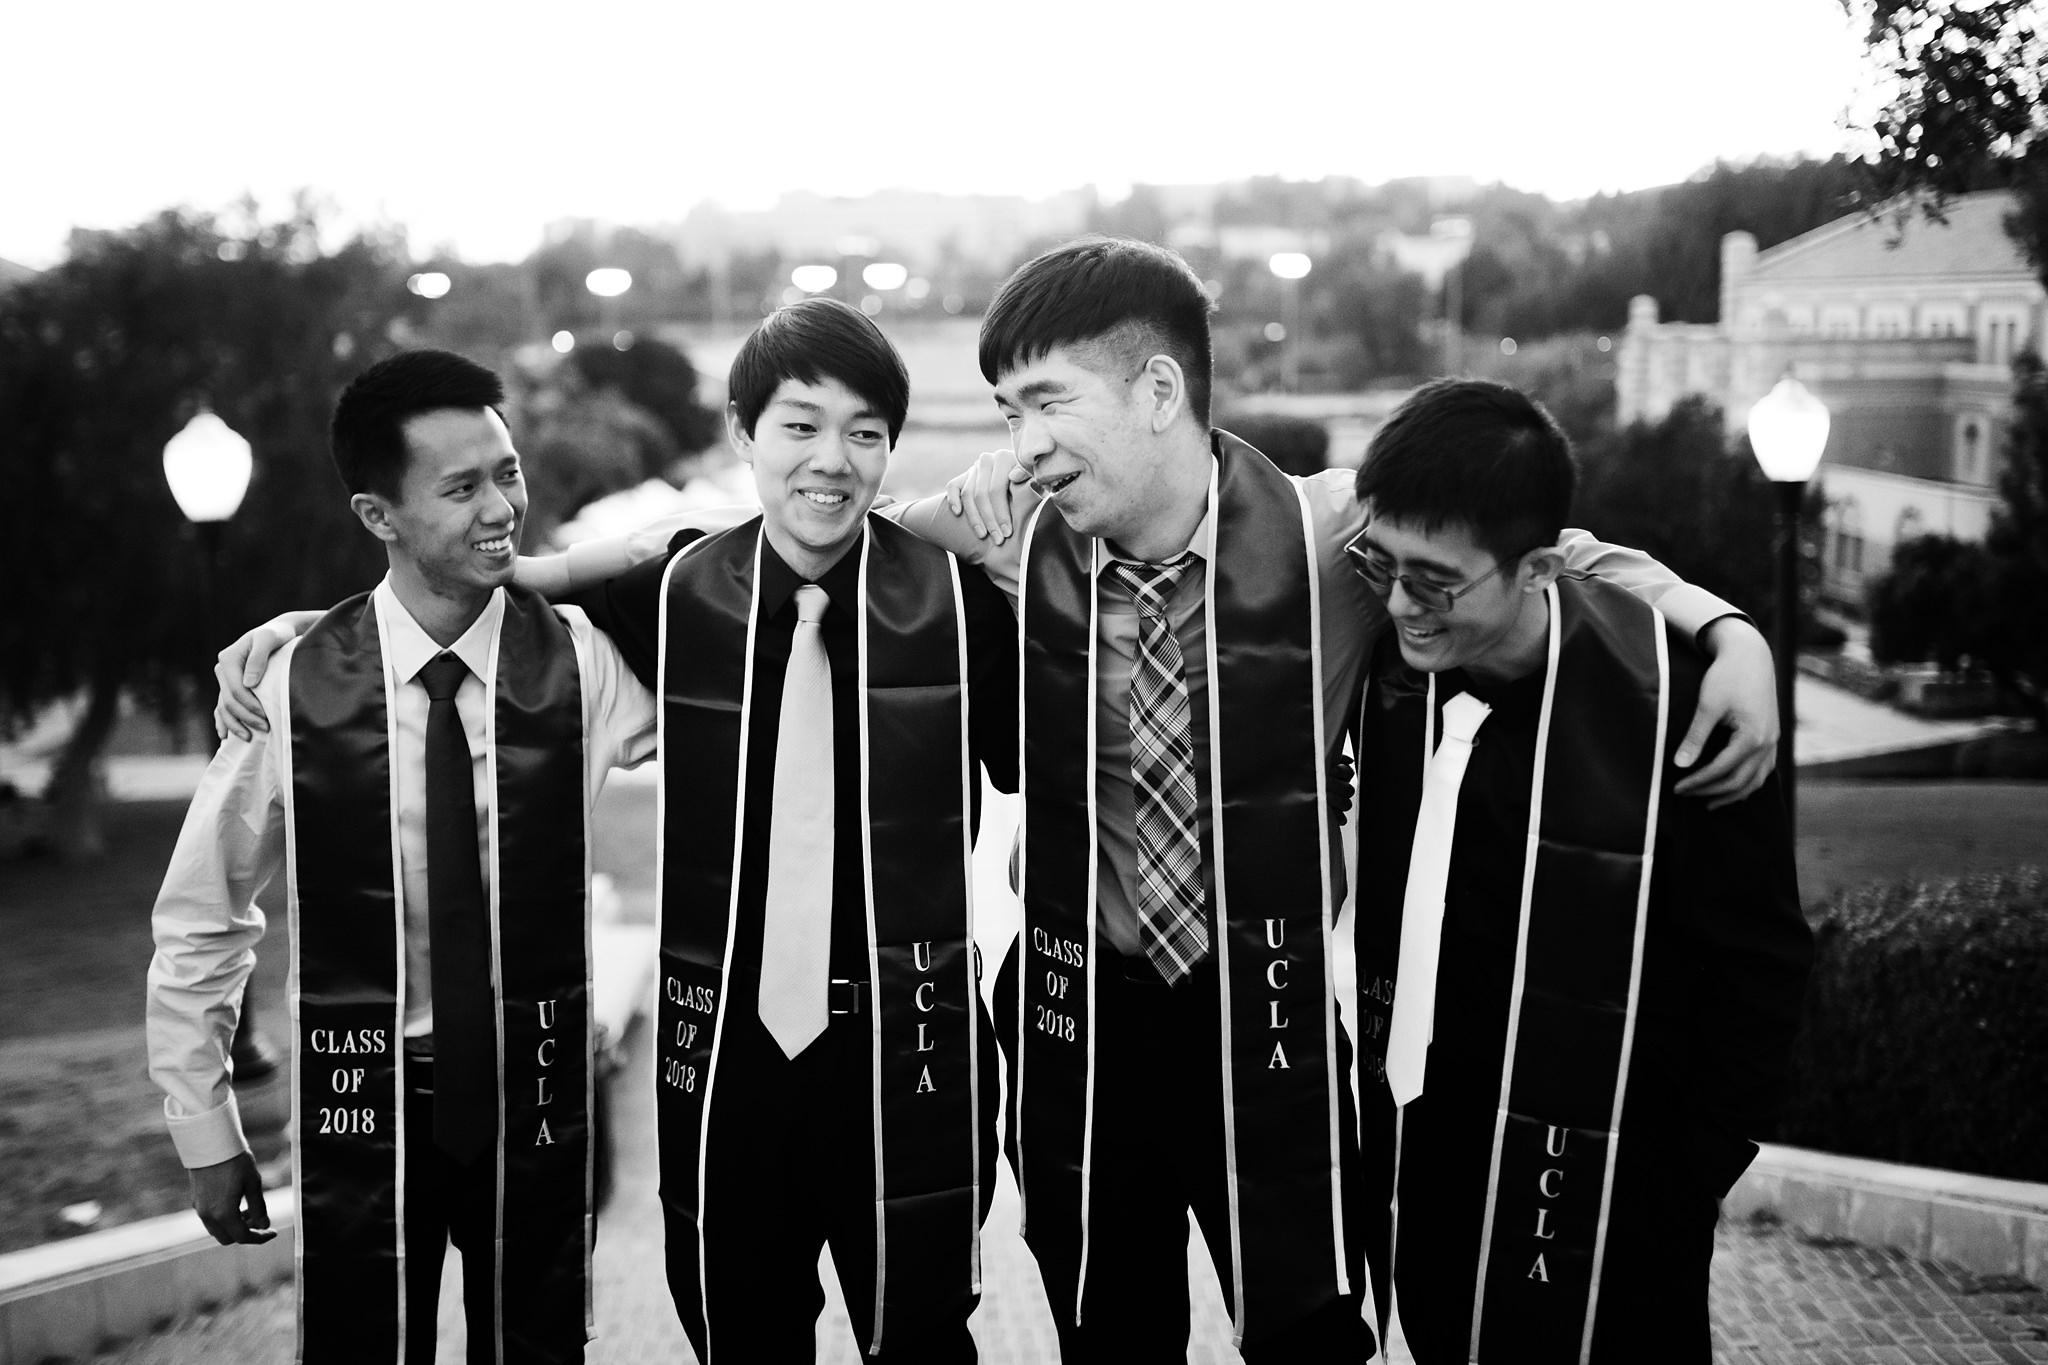 los-angeles-ucla-senior-graduation-portraits-candid-friends-at-janss-steps-black-and-white